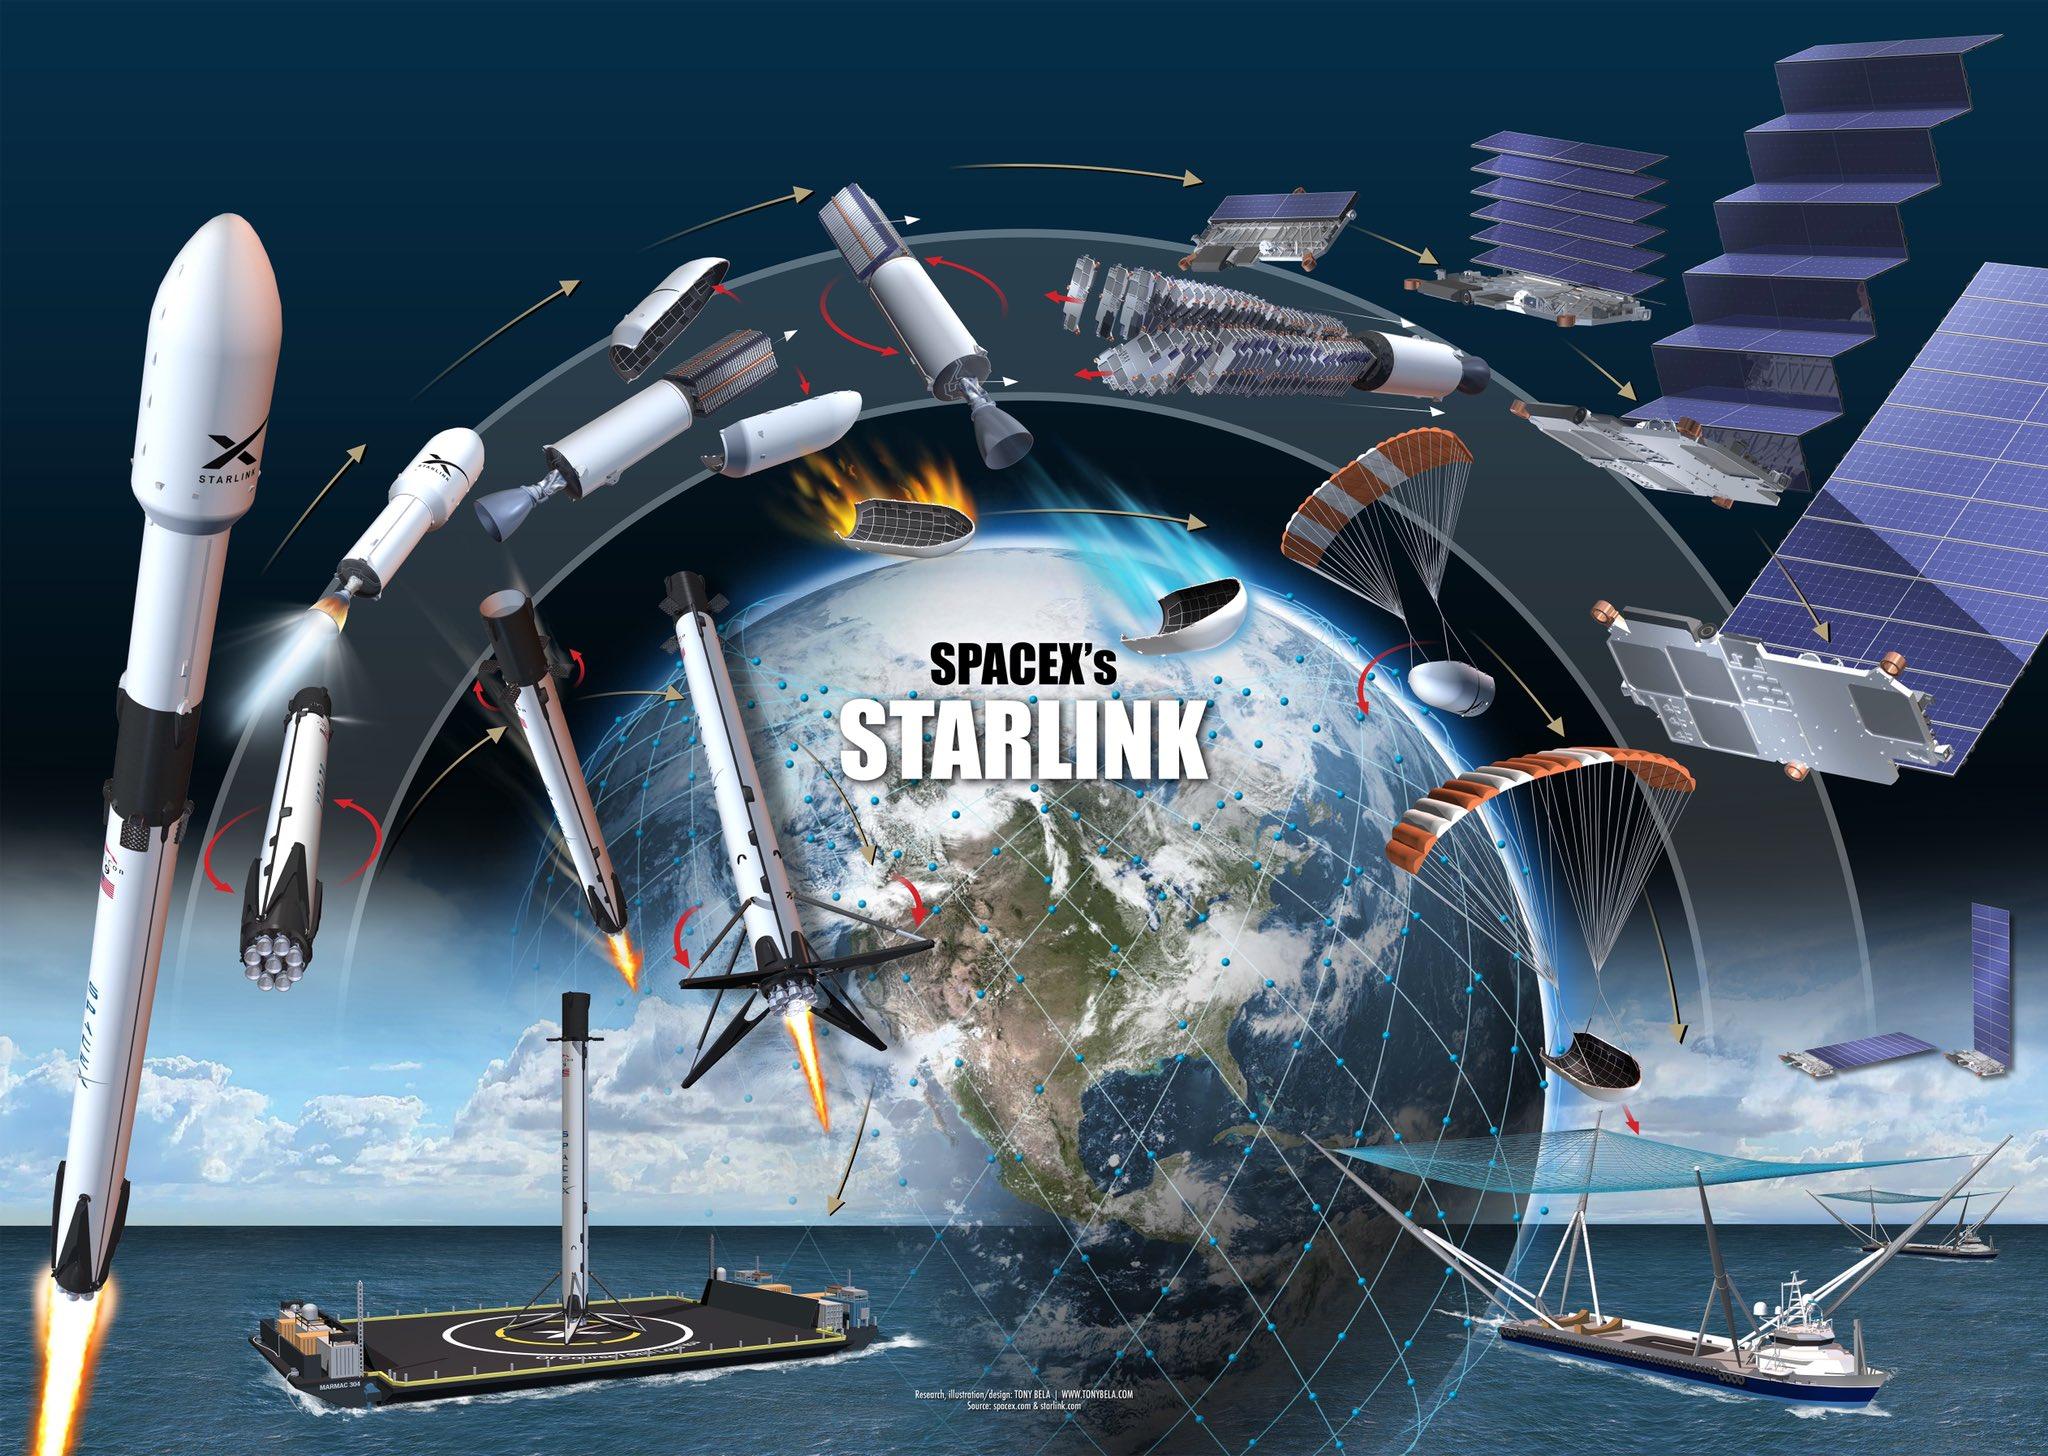 Falcon 9 (Starlink v1.0 L12) - KSC - 6.10.2020 [Succès] - Page 2 11492